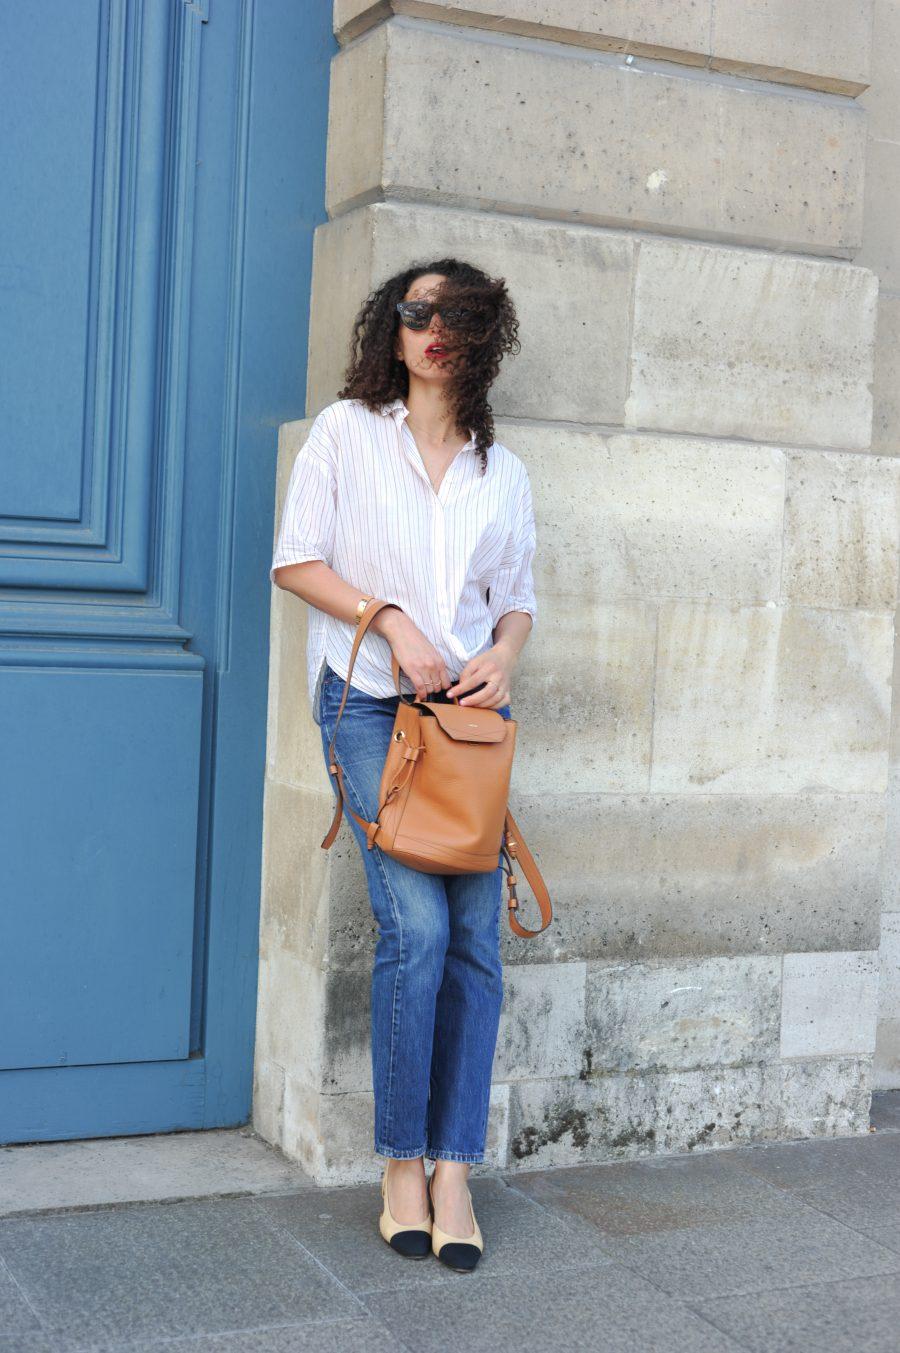 chemise-chemins-blancs-2